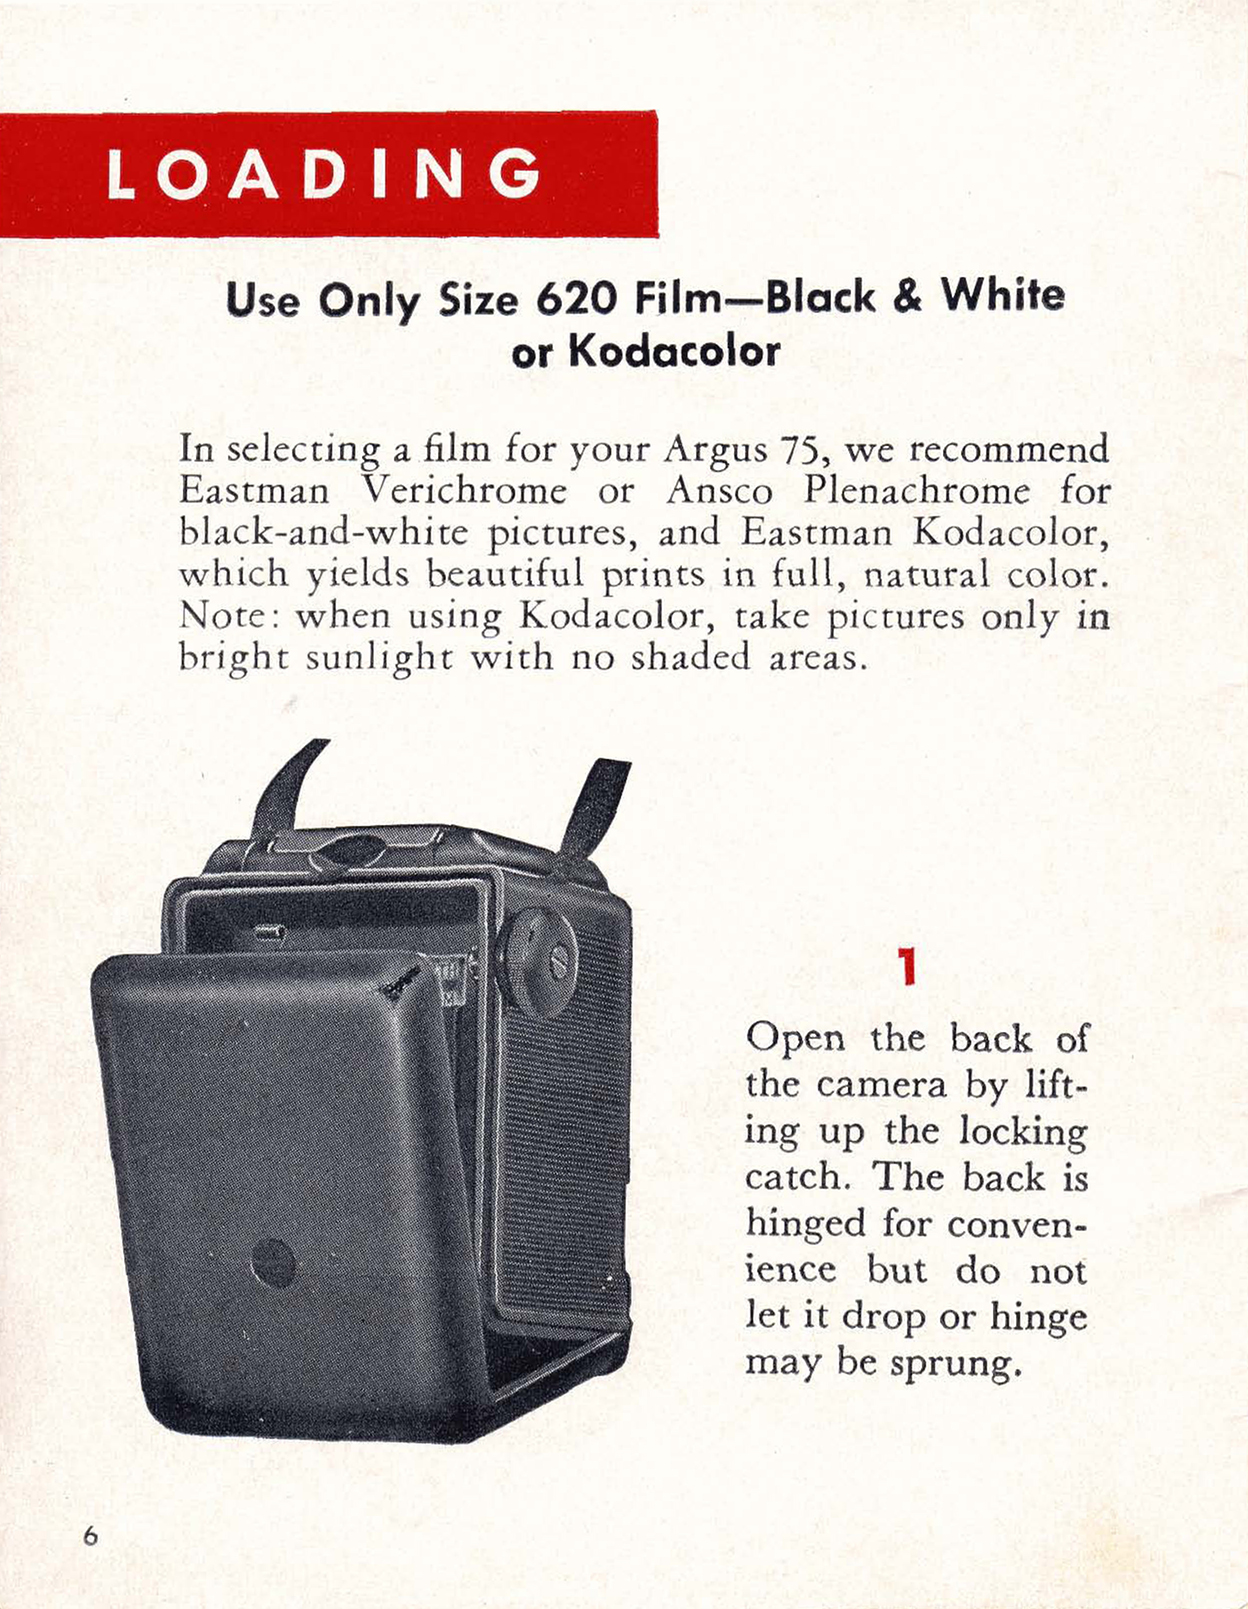 argus 75 instructions for use ann arbor district library rh aadl org Argus 75 Camera Box $75 Vintage Argus Camera